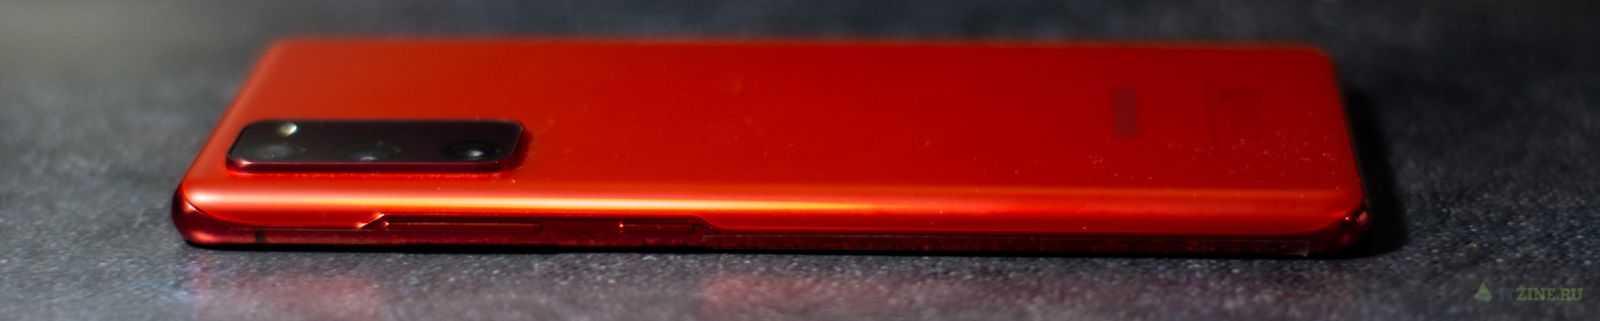 Обзор Samsung Galaxy S20 FE: недорогой, но флагман (DSC 9781)